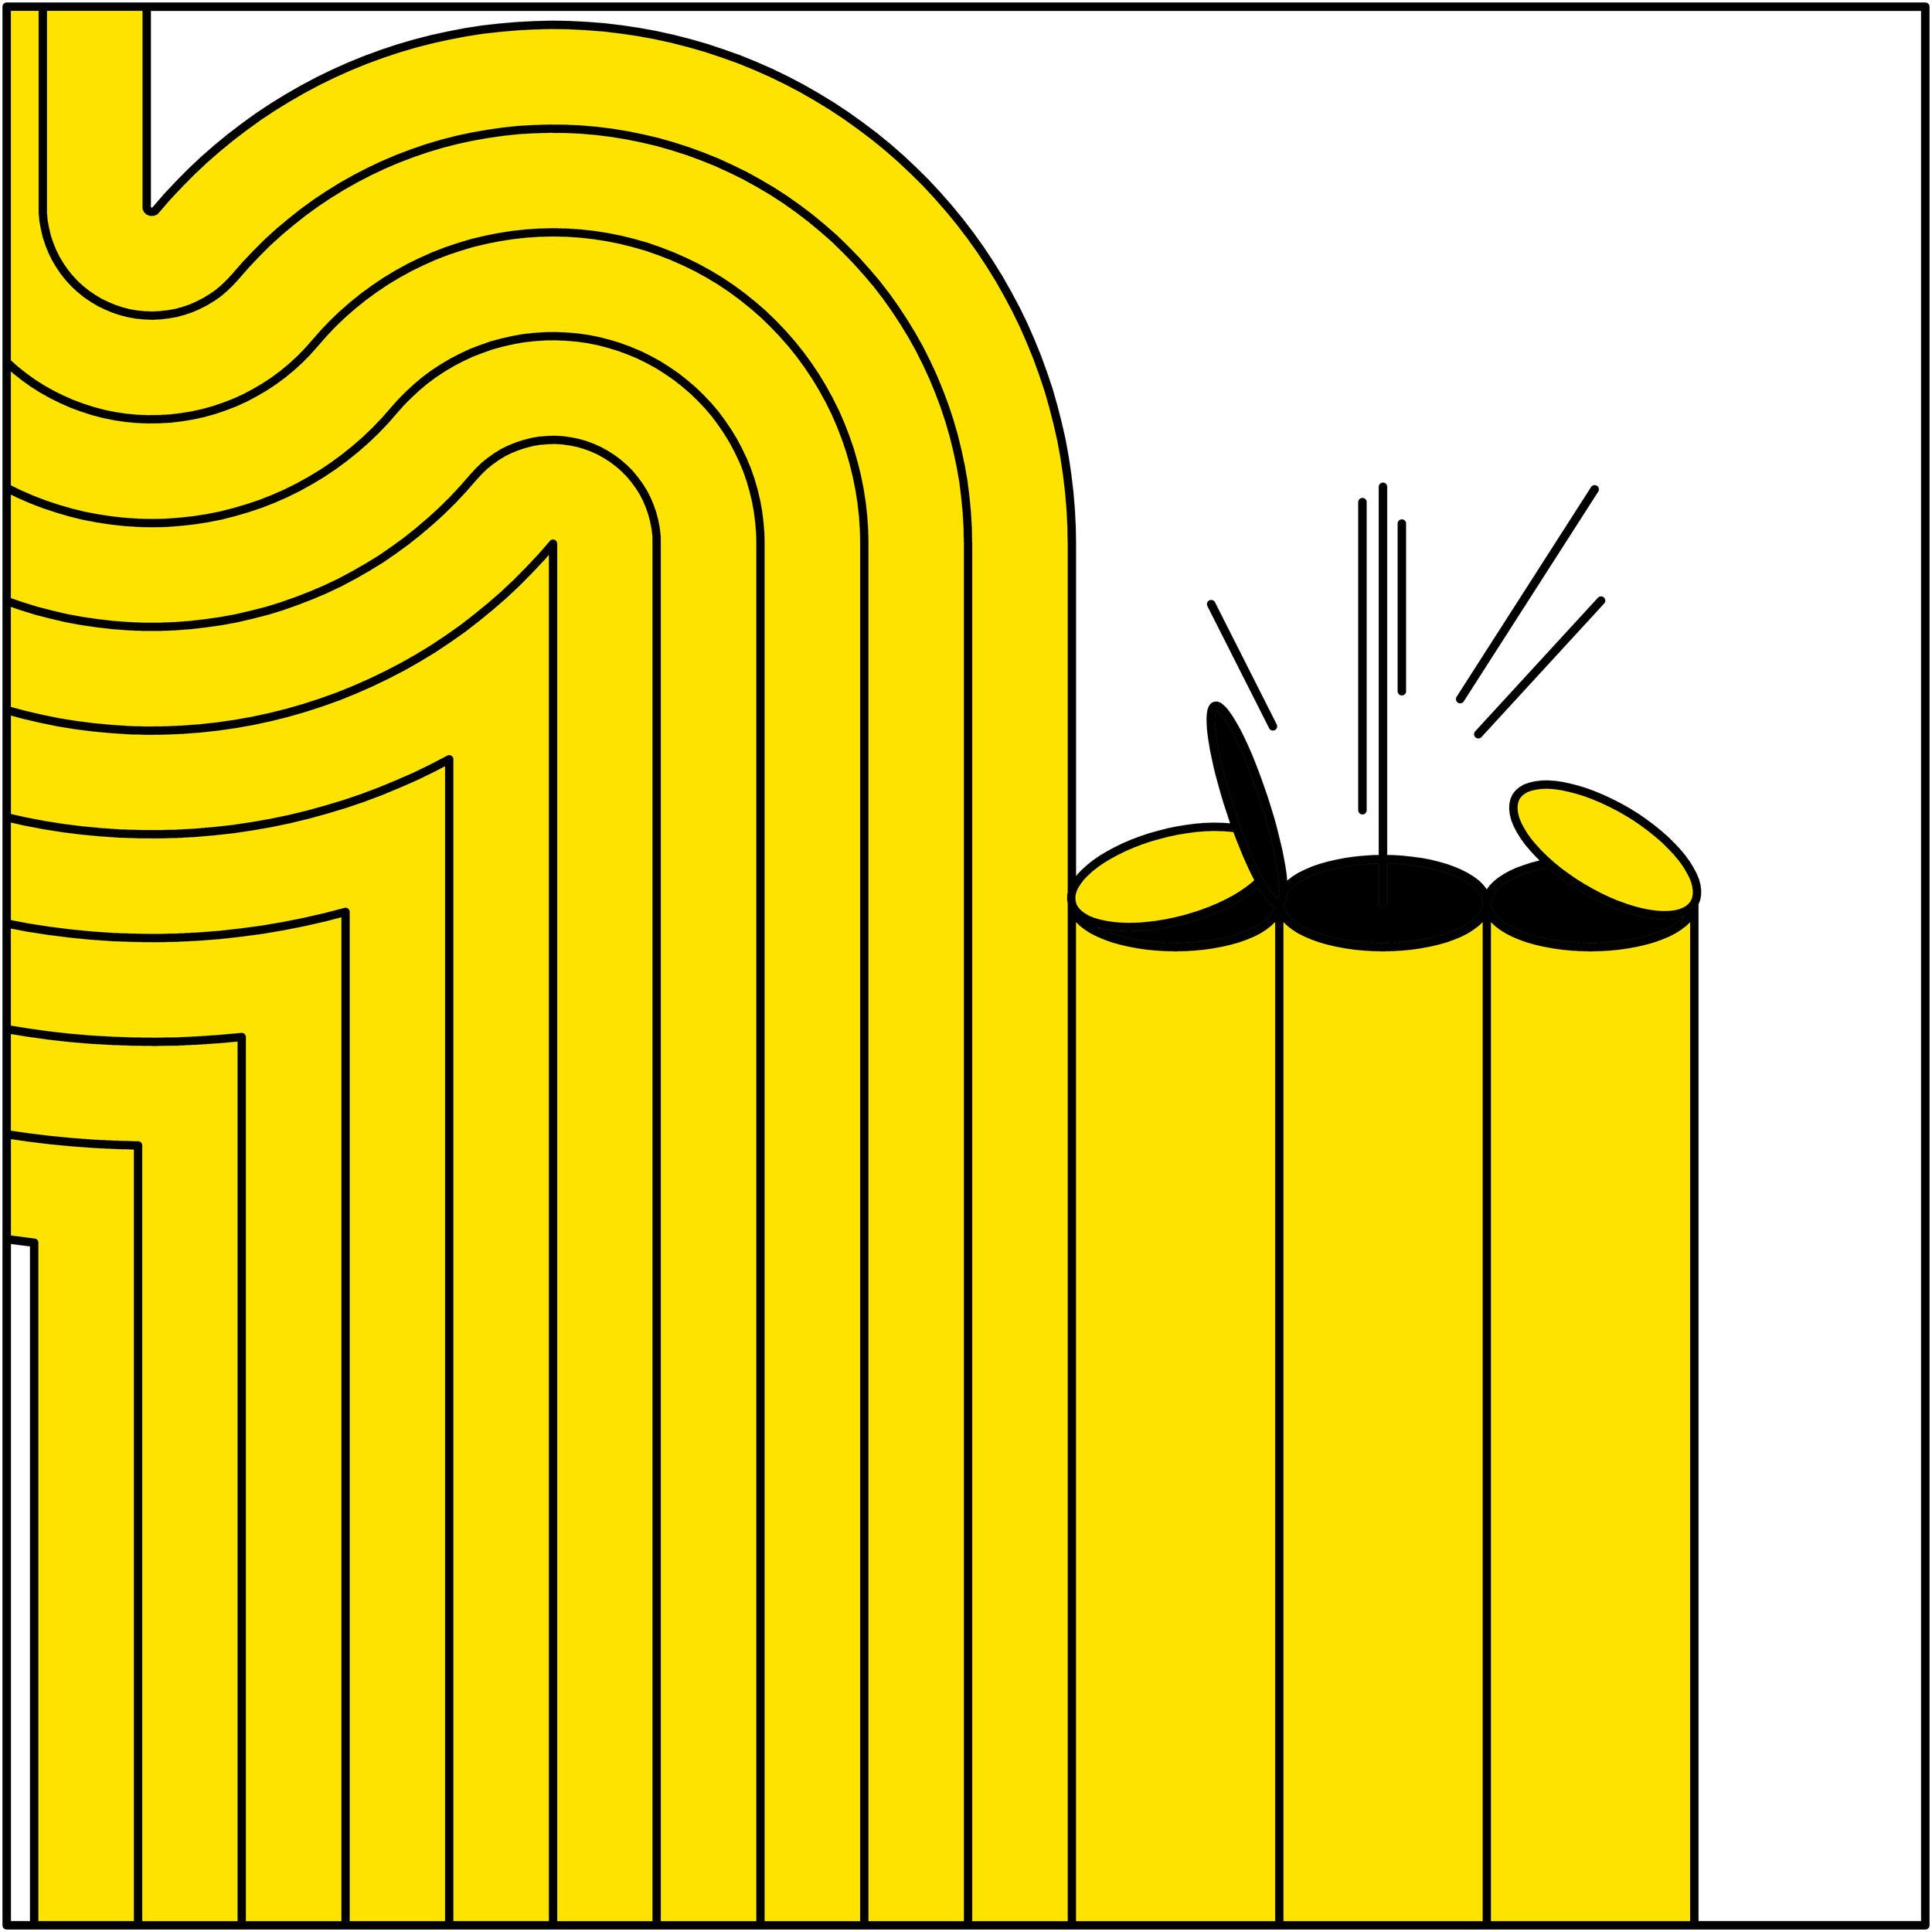 spaghetti yellow - 024.jpg